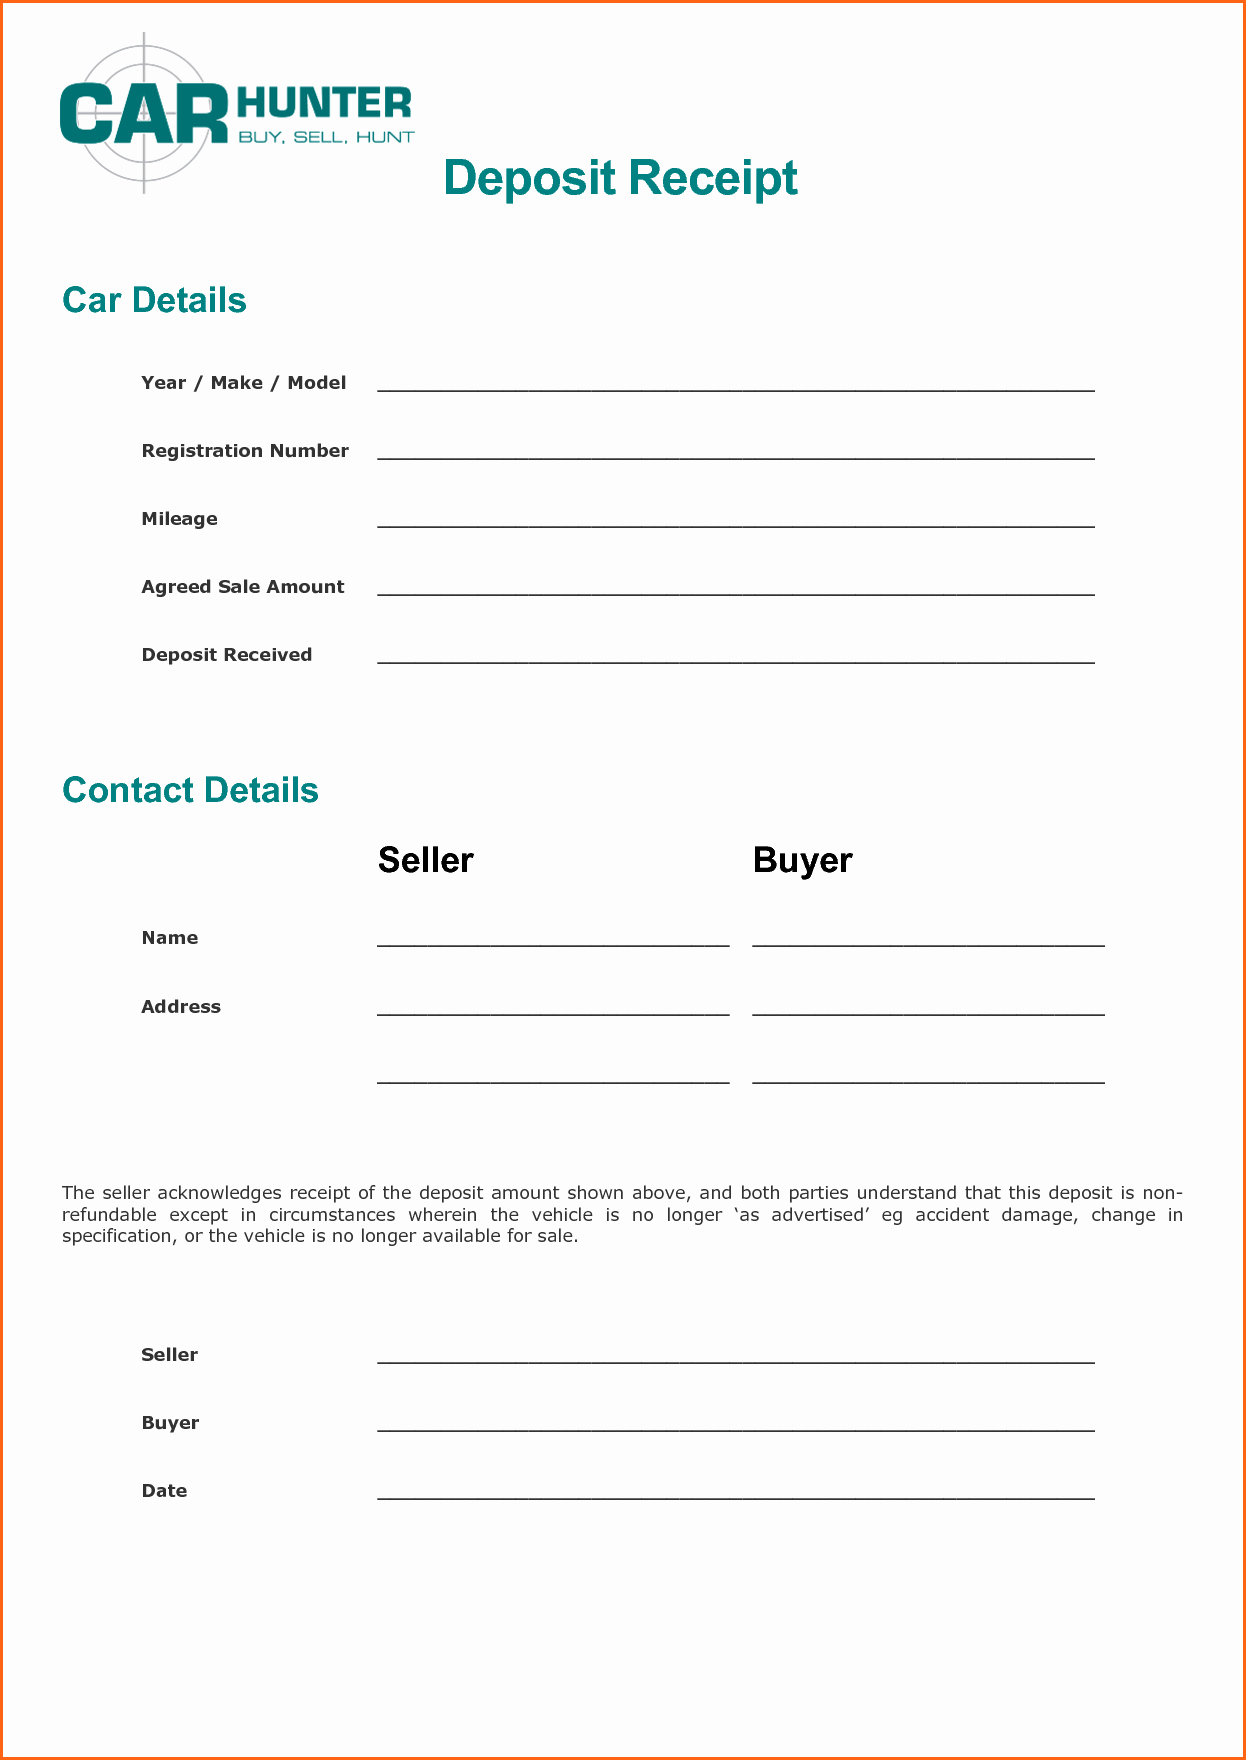 Car Deposit Receipt Word Unique Deposit Car Receipt